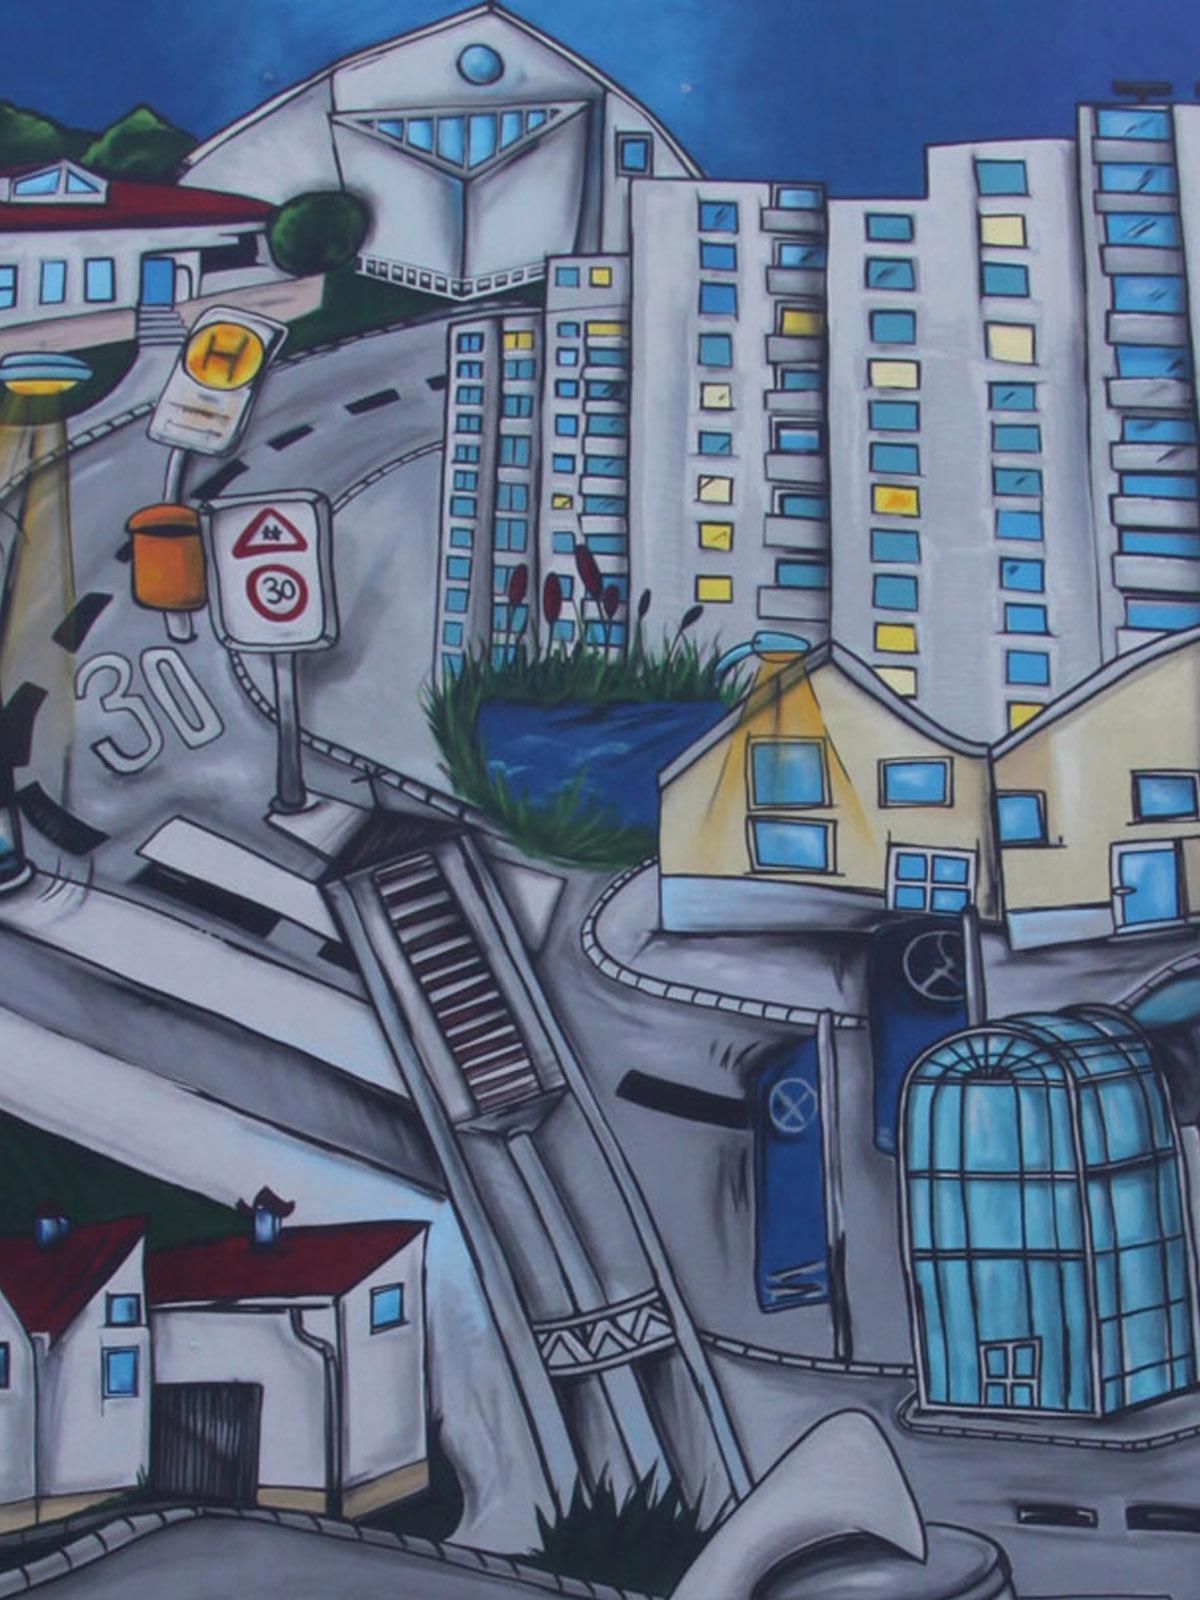 graffitiauftrag_graffitikuenstler_artmos4_baugenossenschaft_odenwaldring_stadt_illustrativ